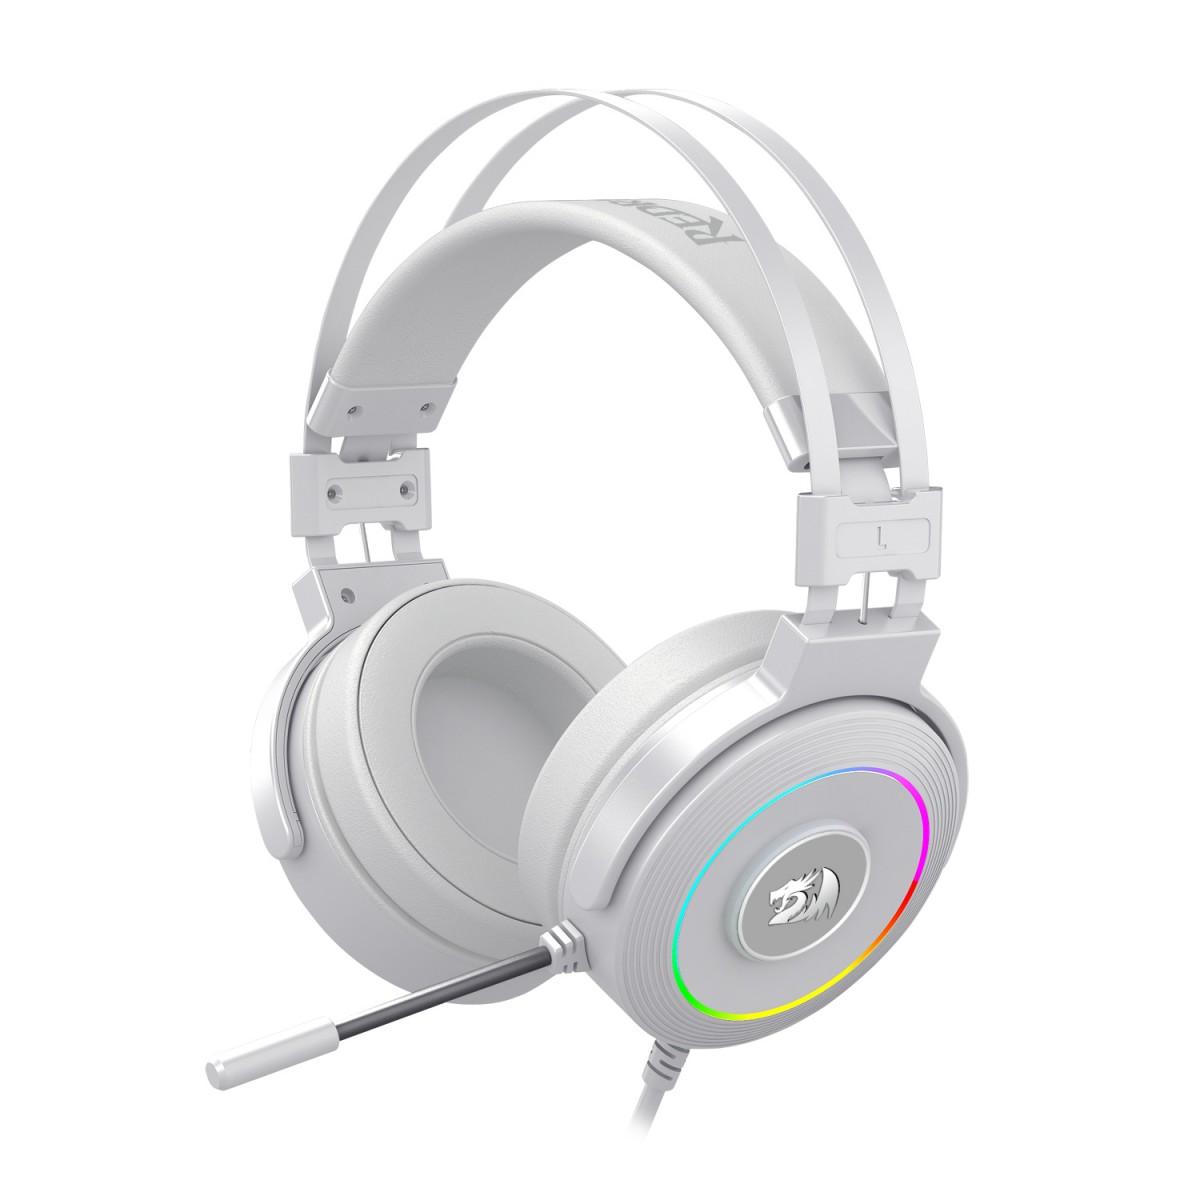 Headset Gamer Redragon Lamia Lunar White H320 RGB, Surround 7.1, Branco, H320W